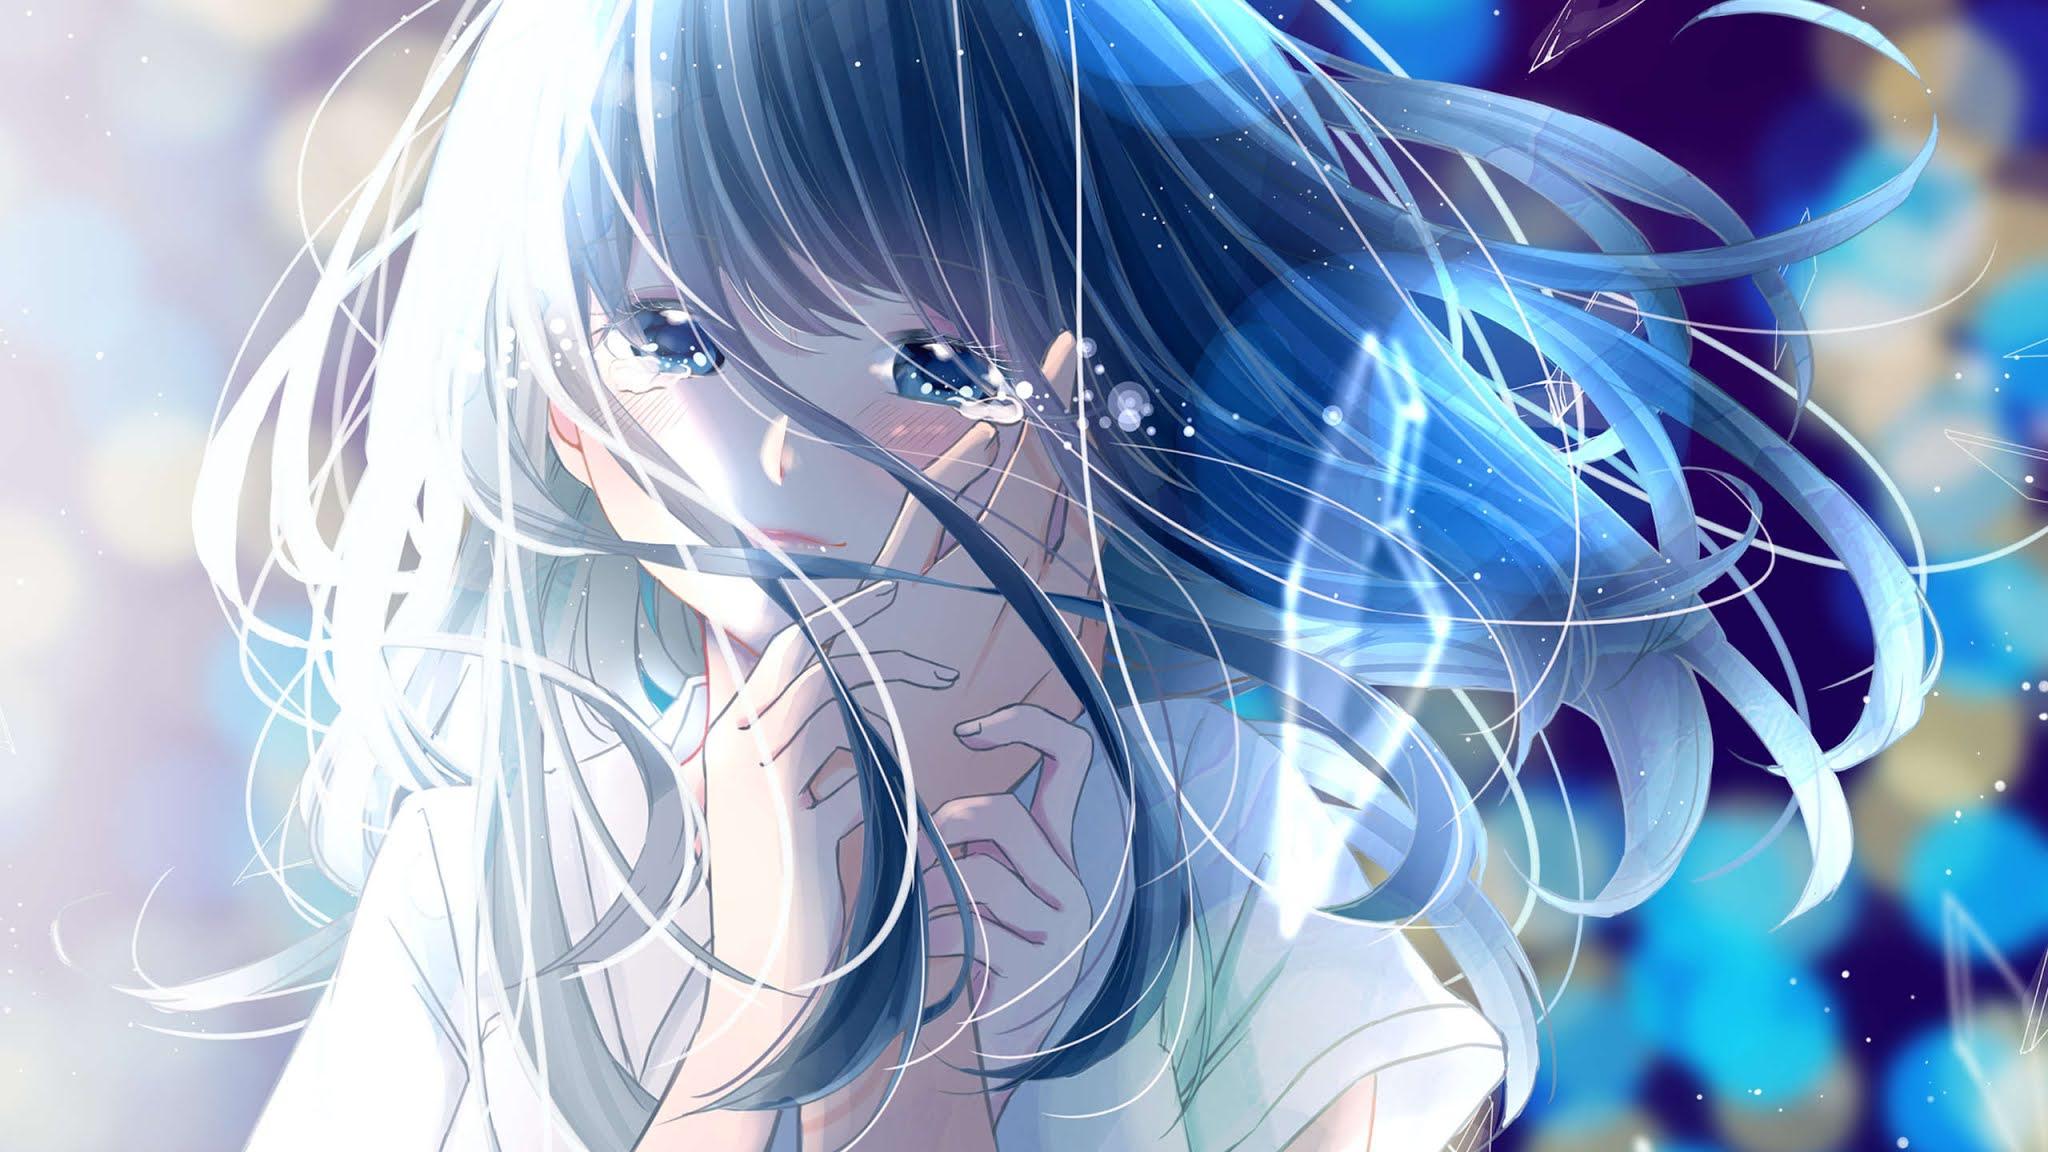 Anime mengangis wallpaper pc